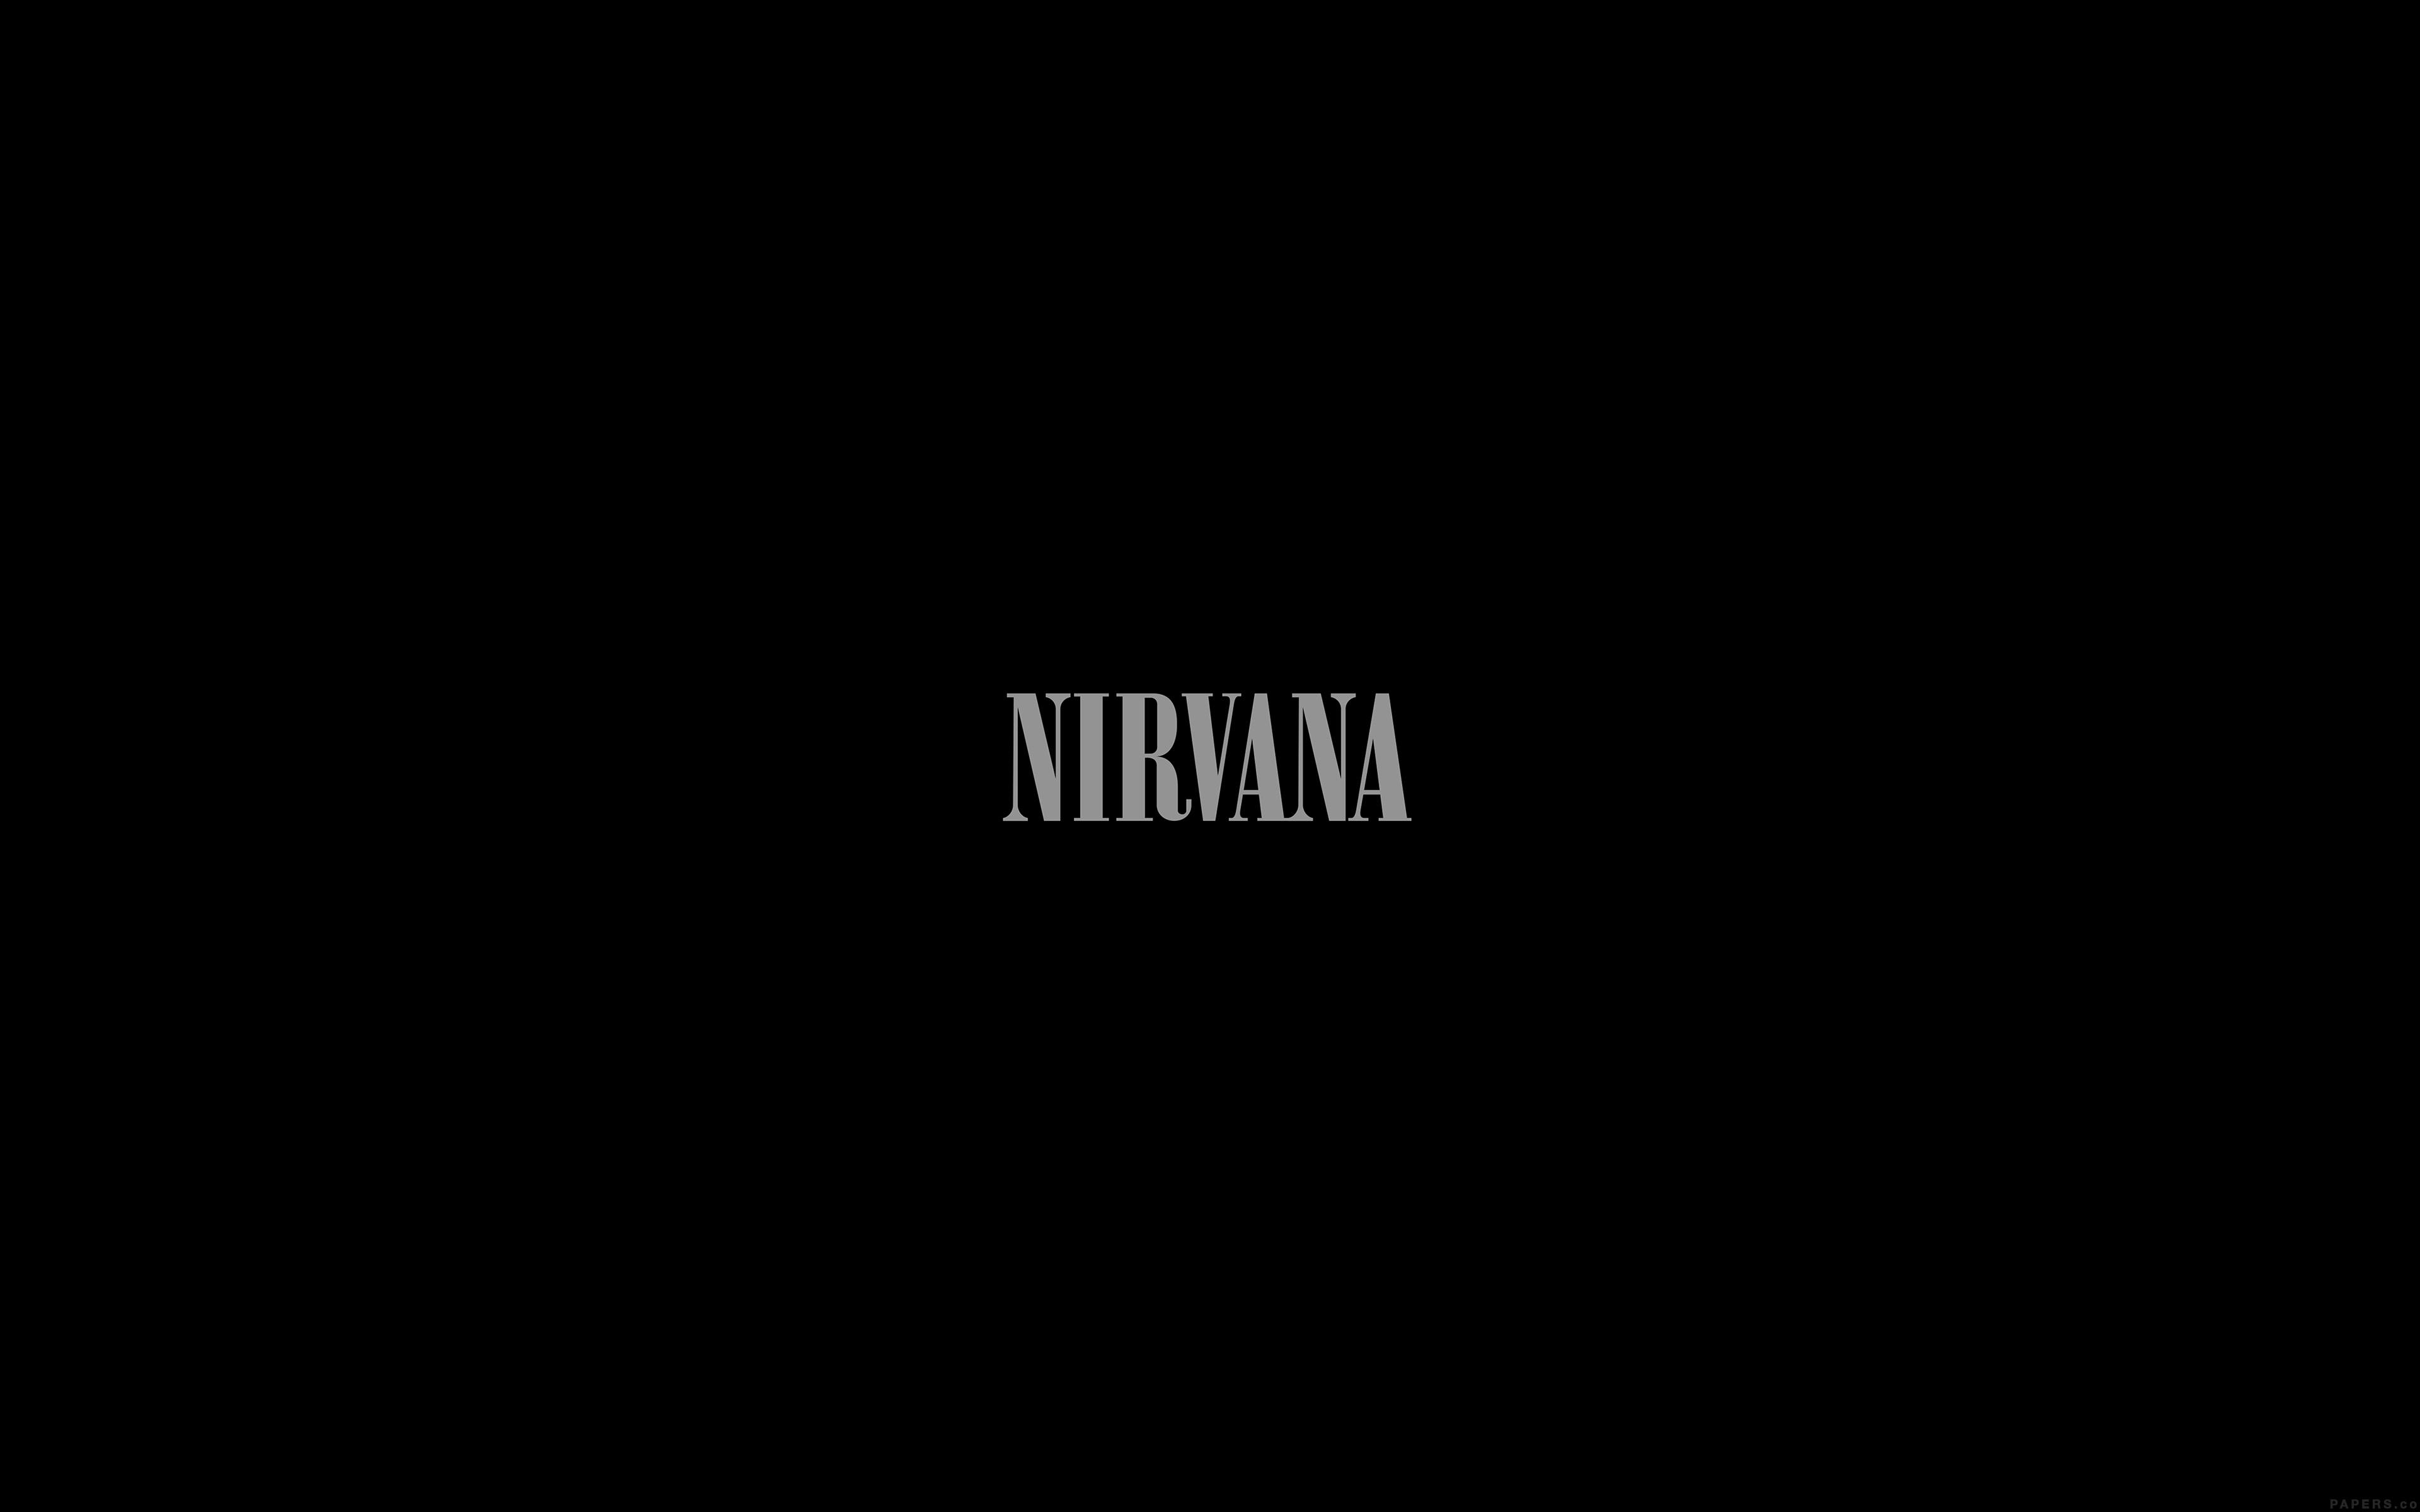 Cute Japanese Art 4k Wallpaper Ak78 Nirvana Dark Logo Simple Minimal Music Wallpaper